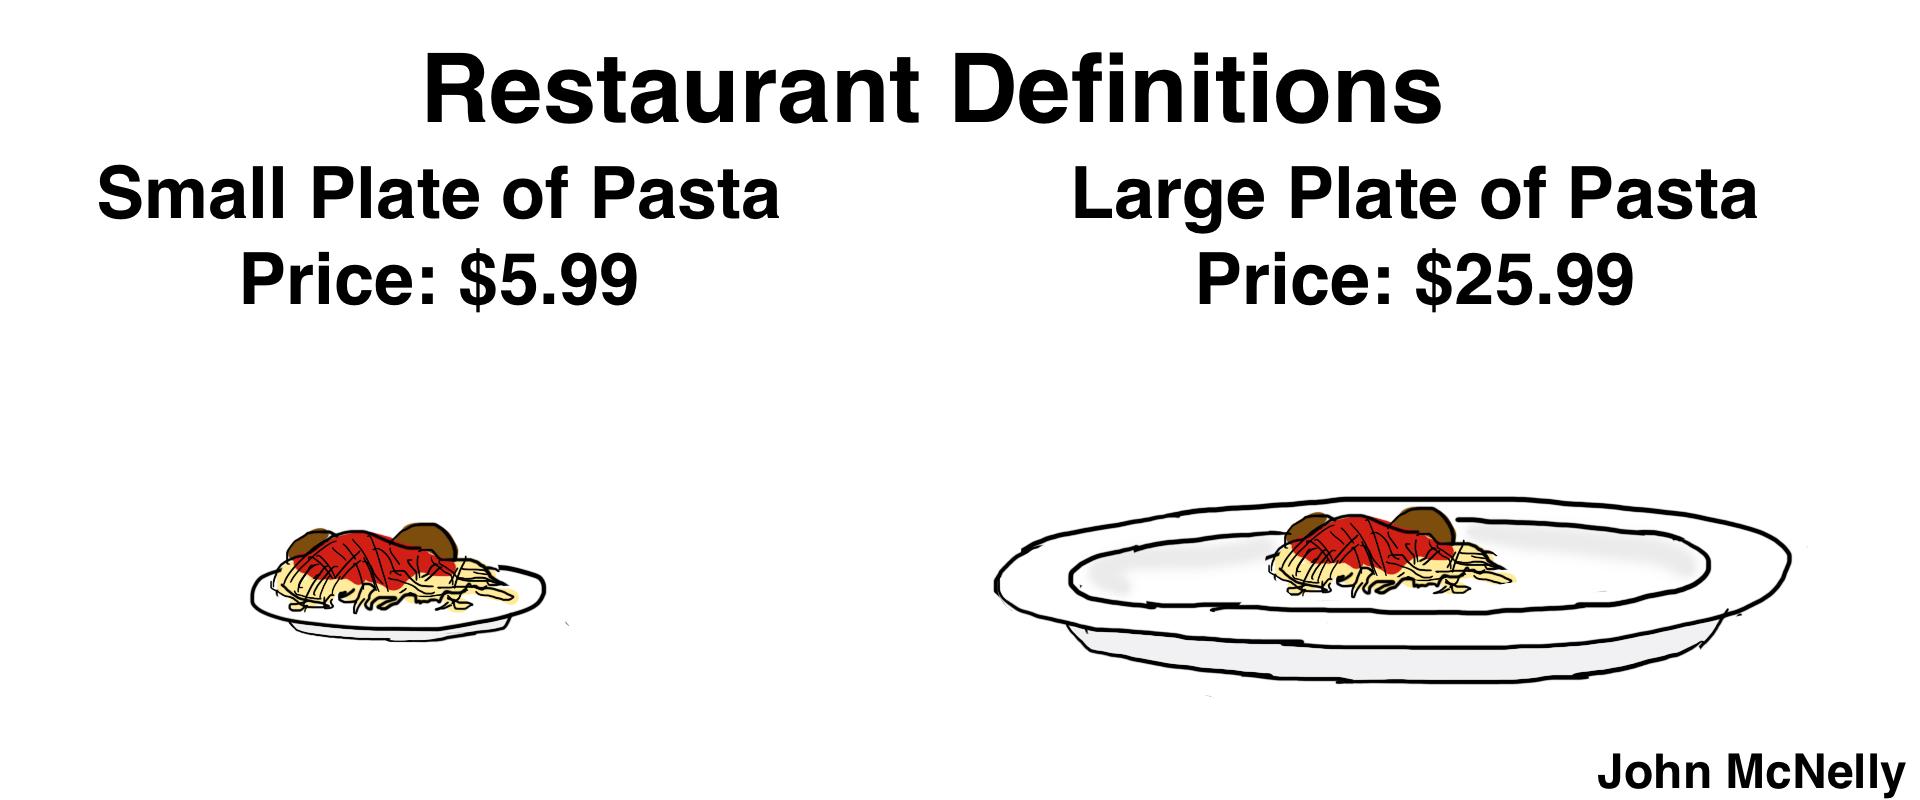 Restaurant Definitions